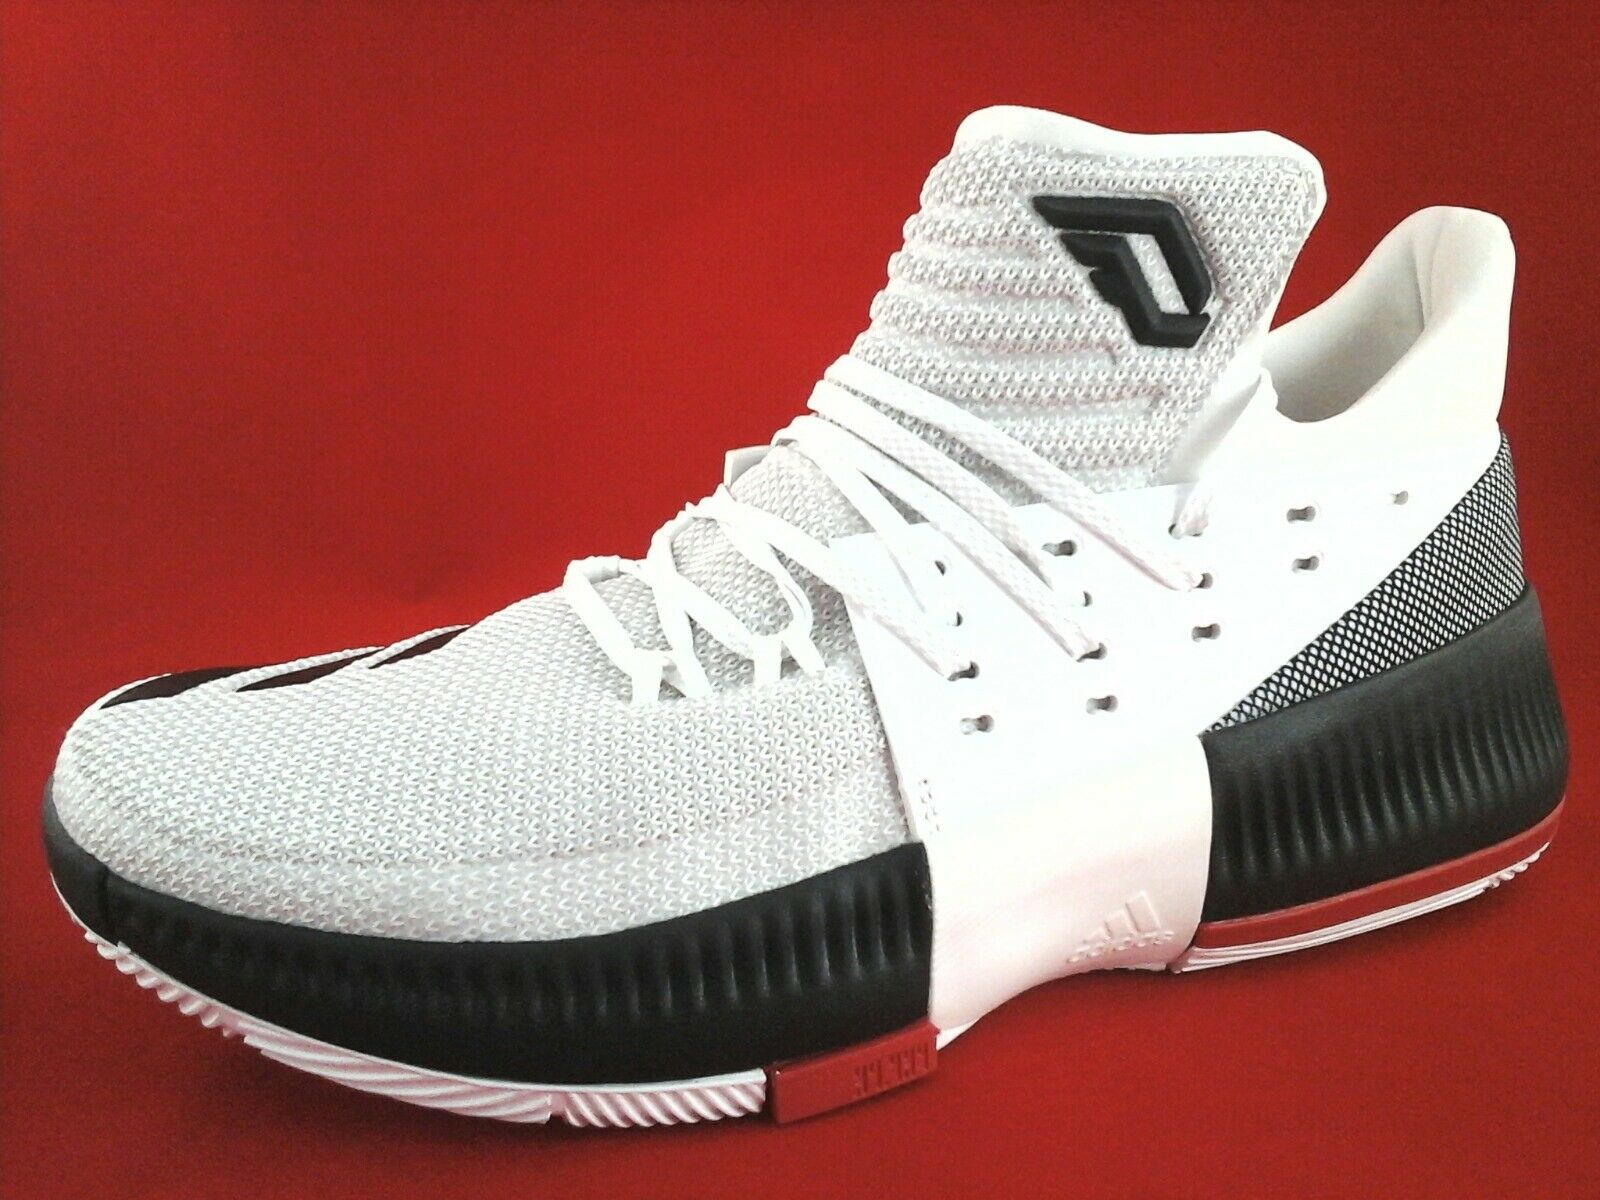 Adidas Damian Lillard Dame 3 WBR BB8268 Basketball NBA Shoes US 10 New